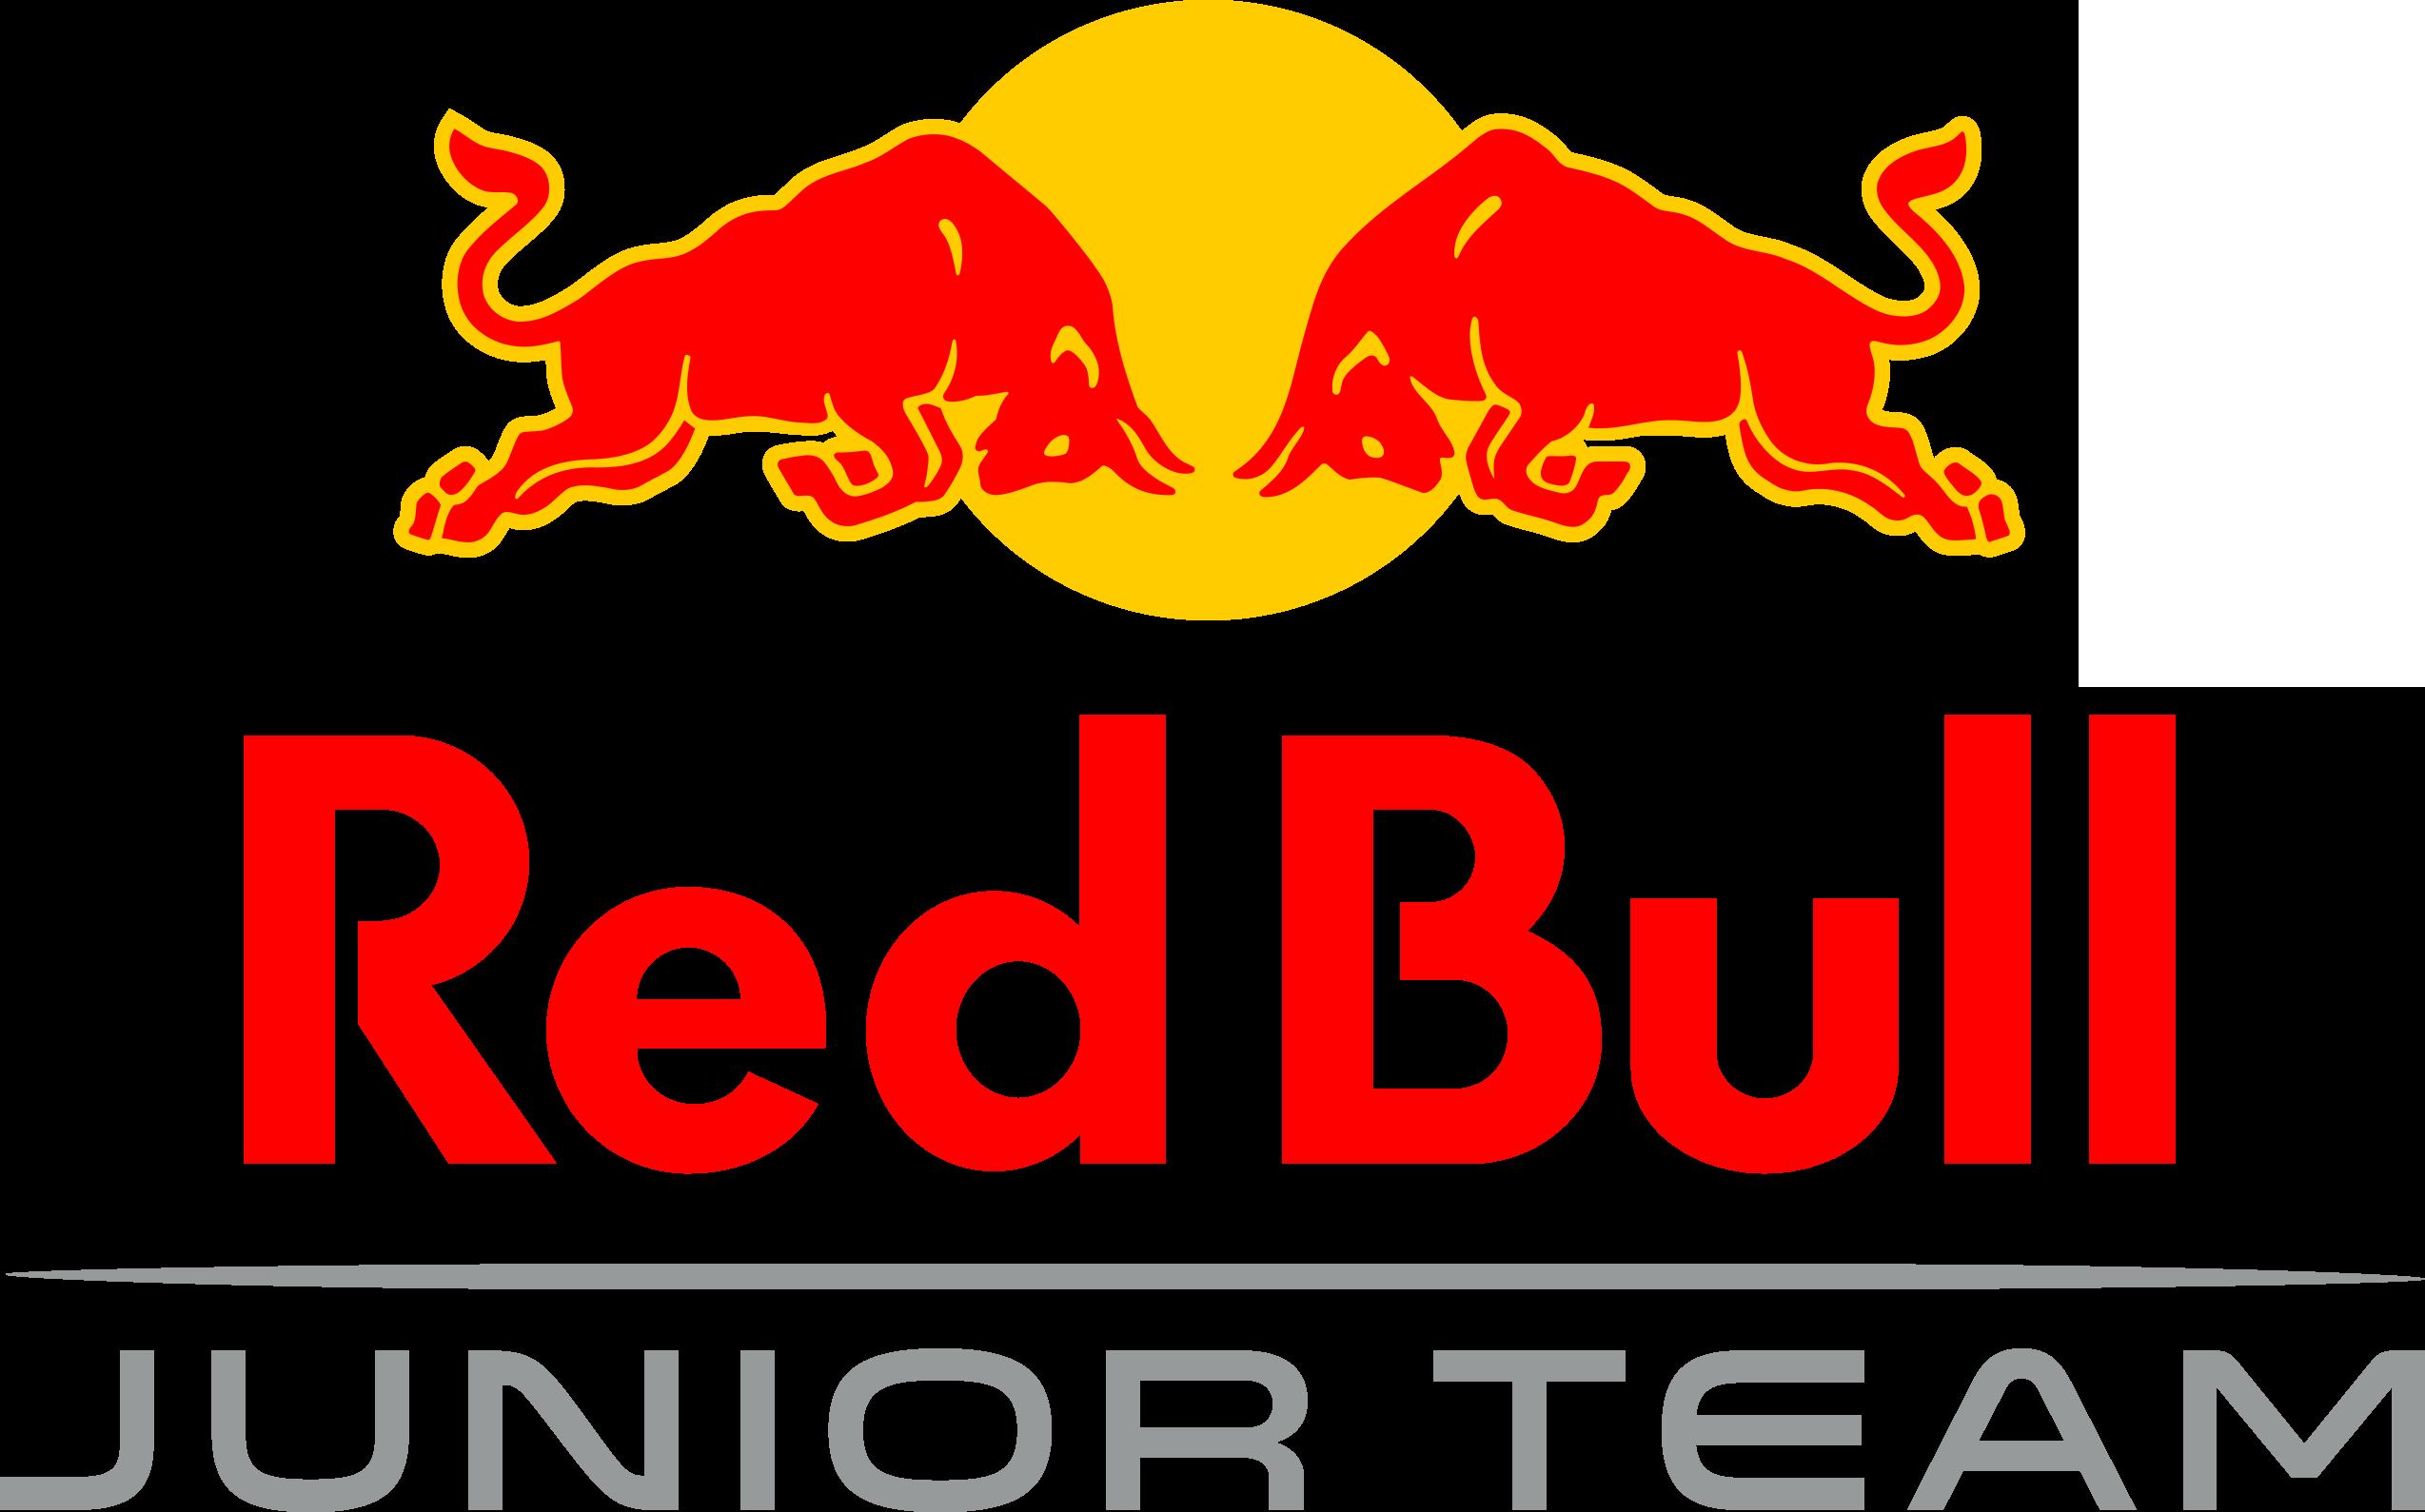 Red Bull Junior Team logo